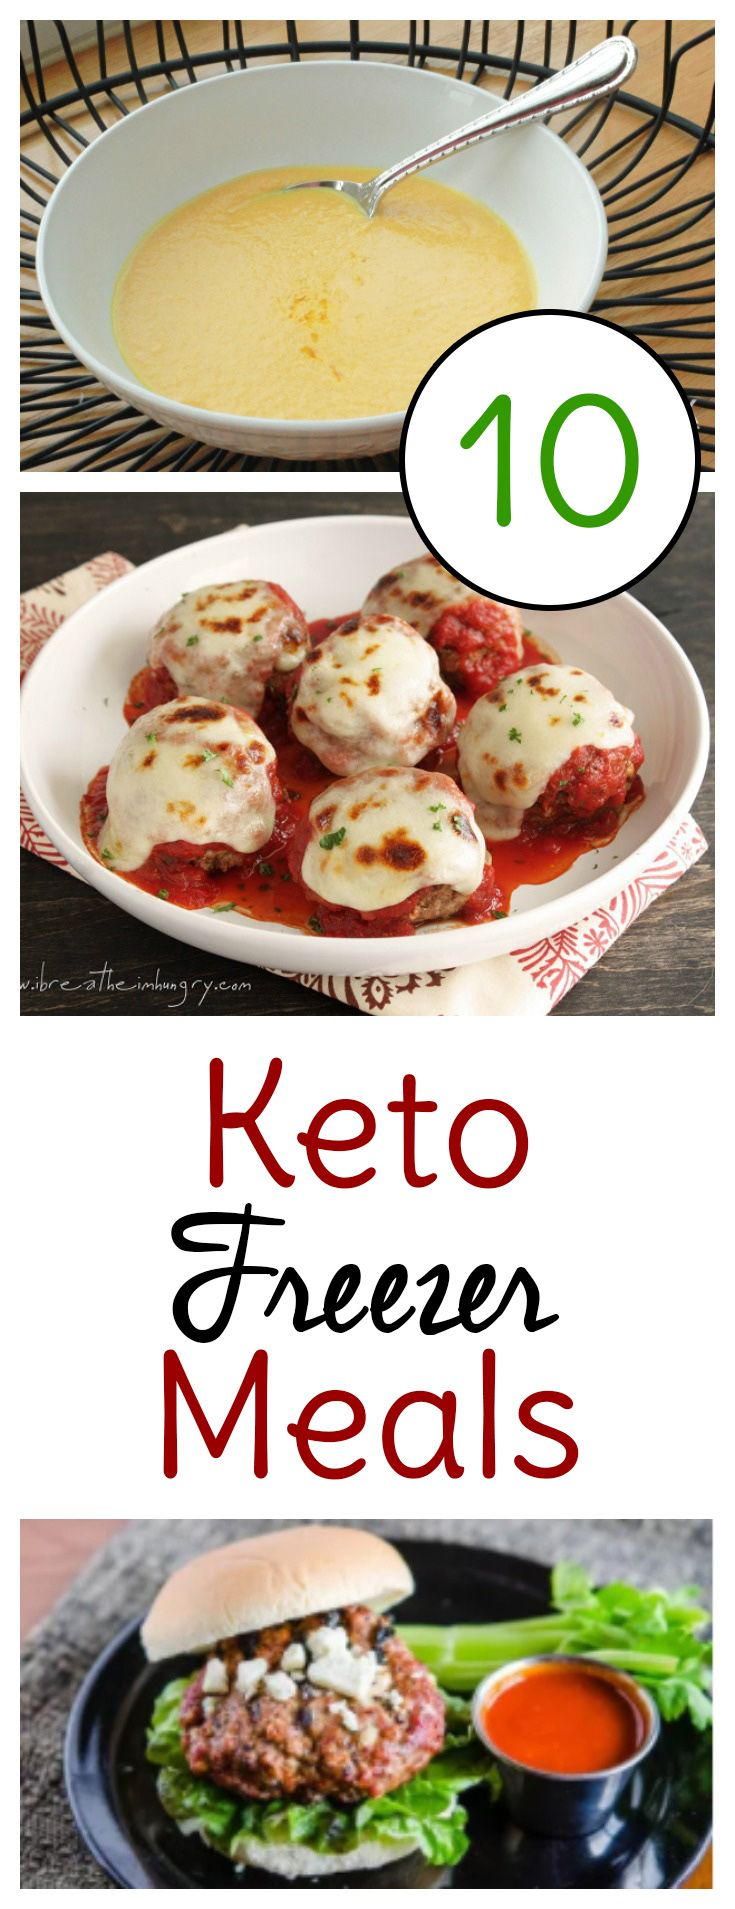 Keto Air Fryer Recipes Zucchini